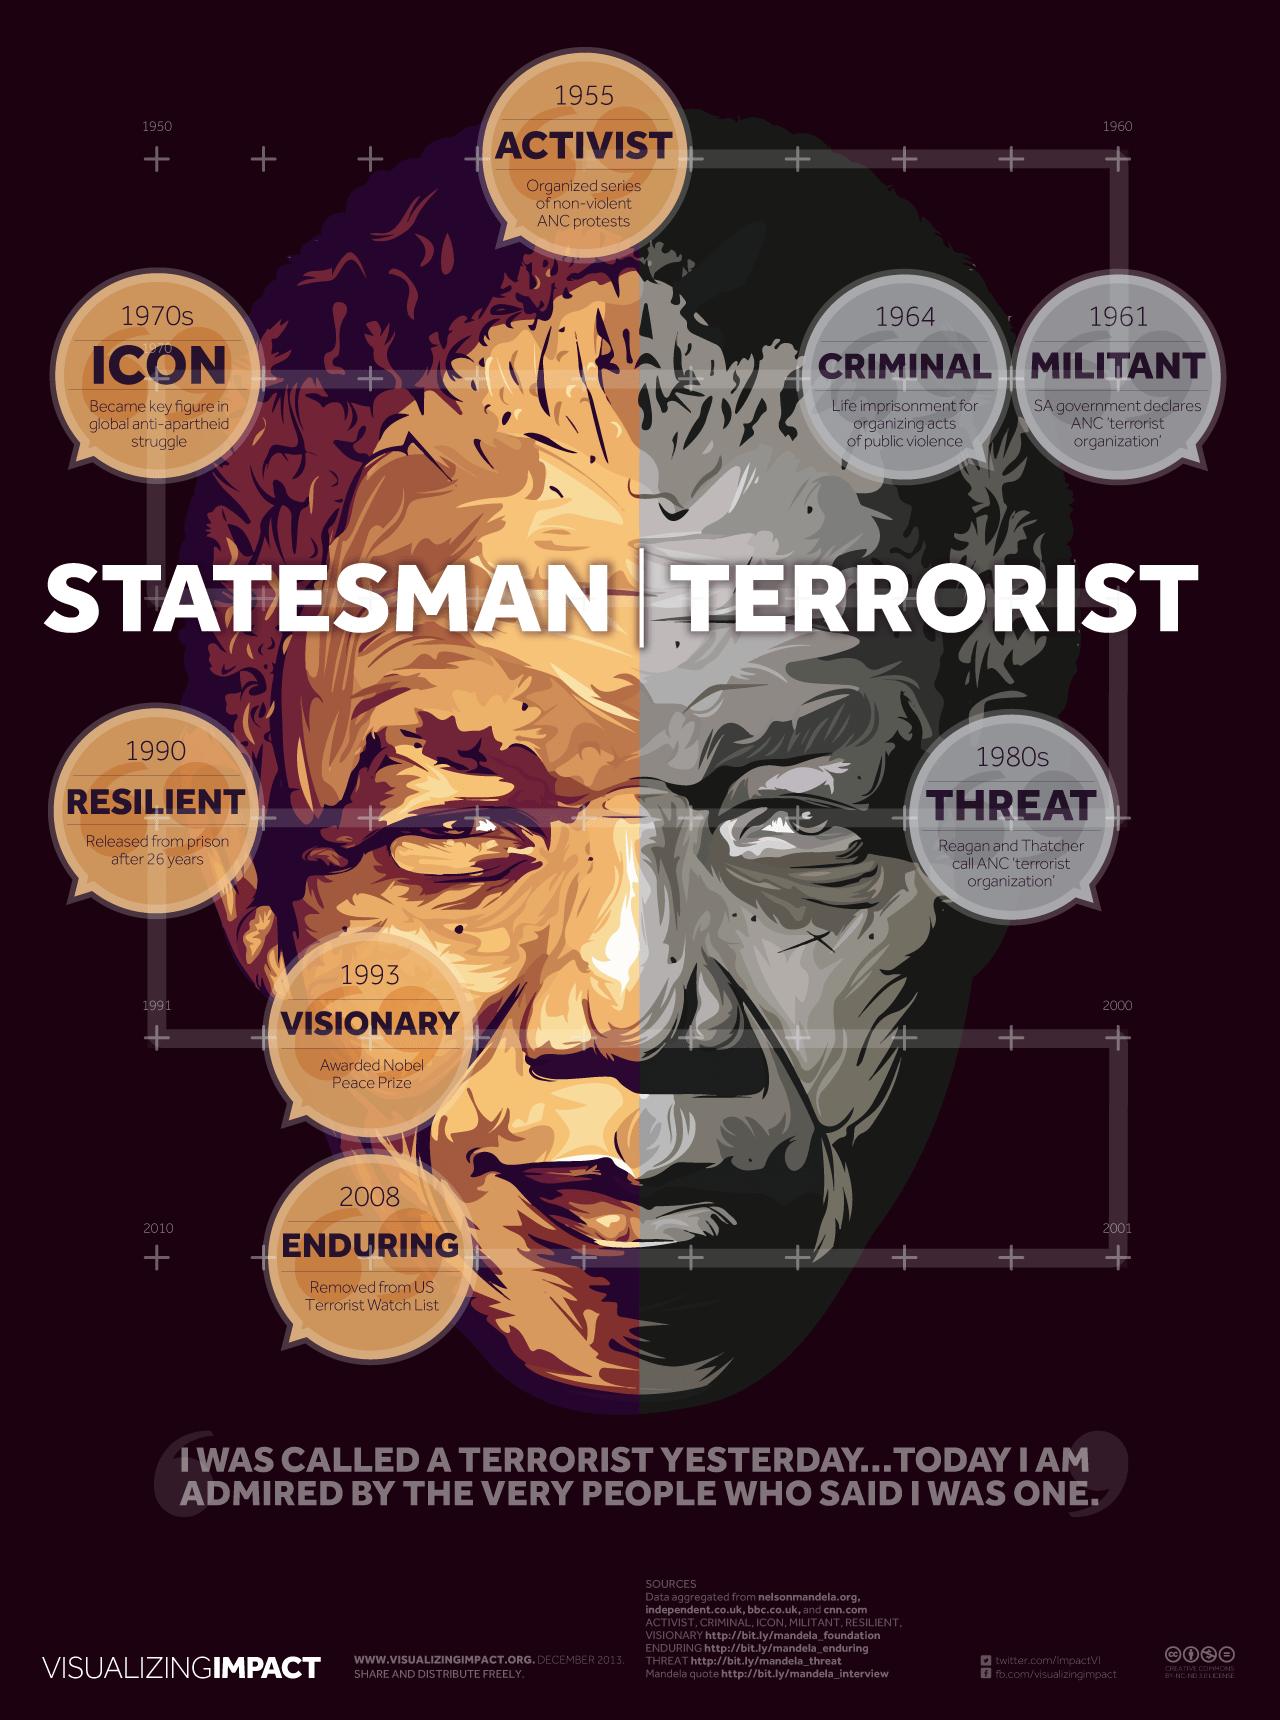 COMMEMORATING MANDELA (2) - VISUALIZING IMPACT | STATESMAN-TERRORIST